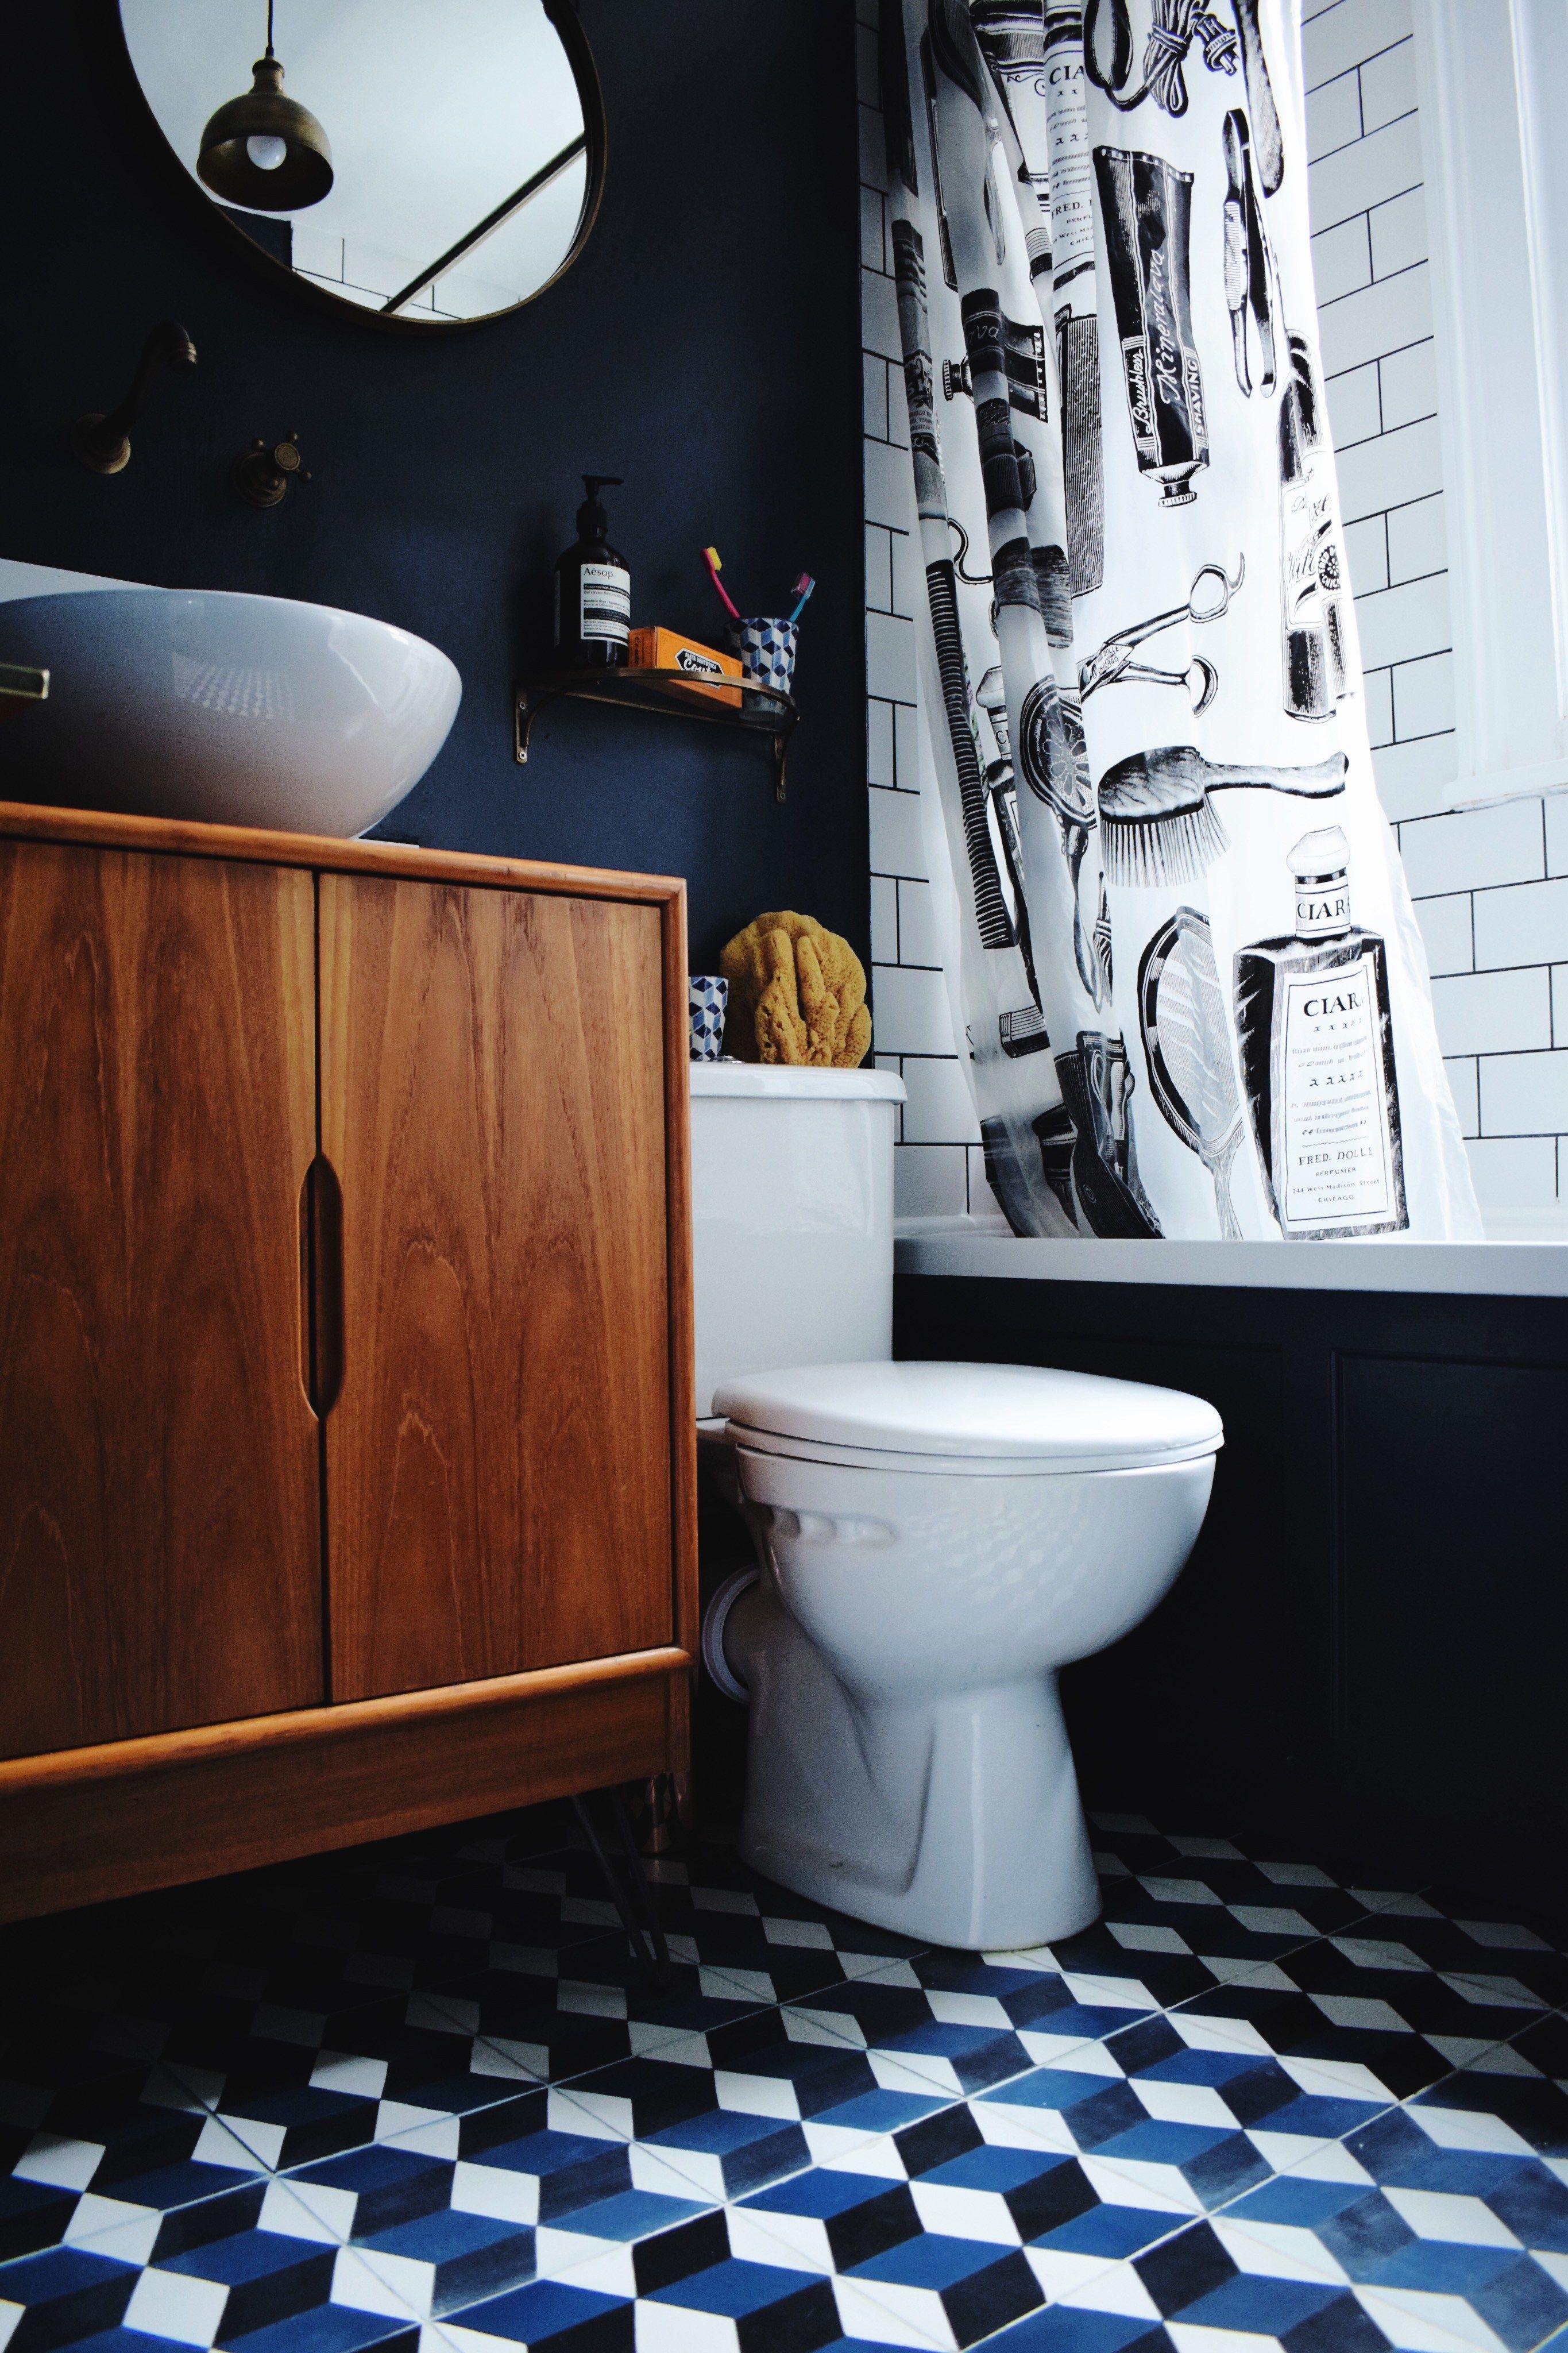 Bathroom Decorating Ideas Inspiration Patterned Tiles Vintage Mid Century Bathroom Decor